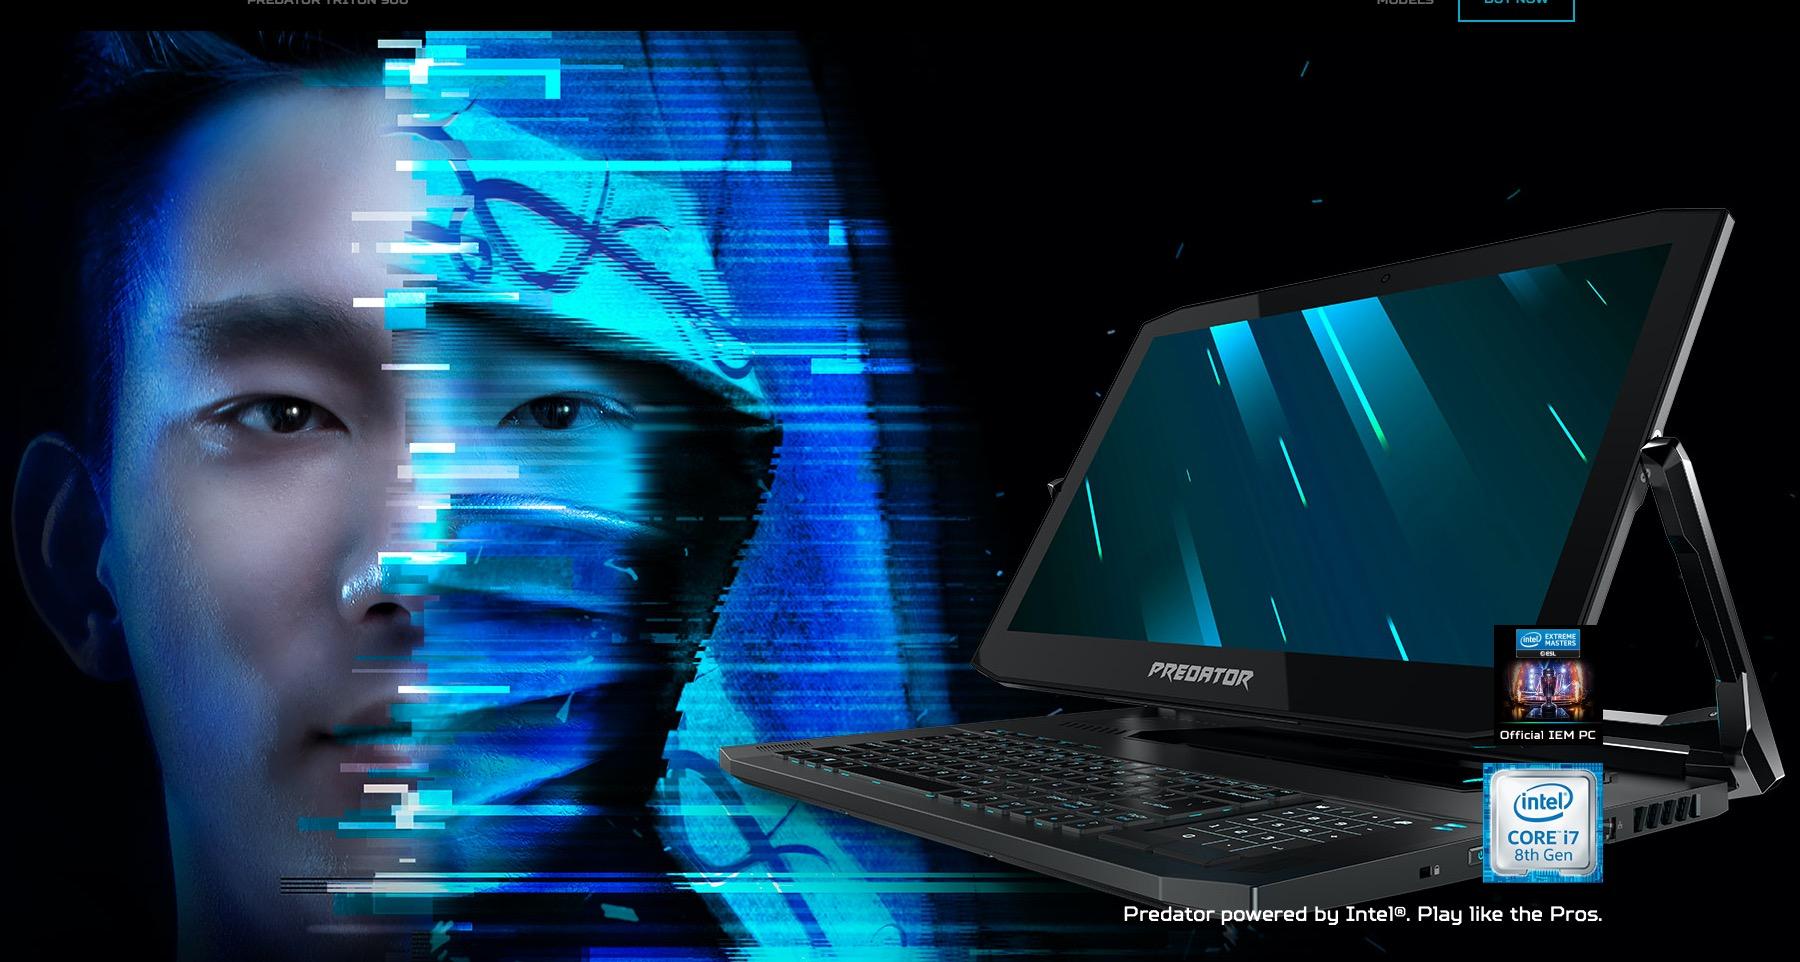 Acer Predator Triton 900 hero